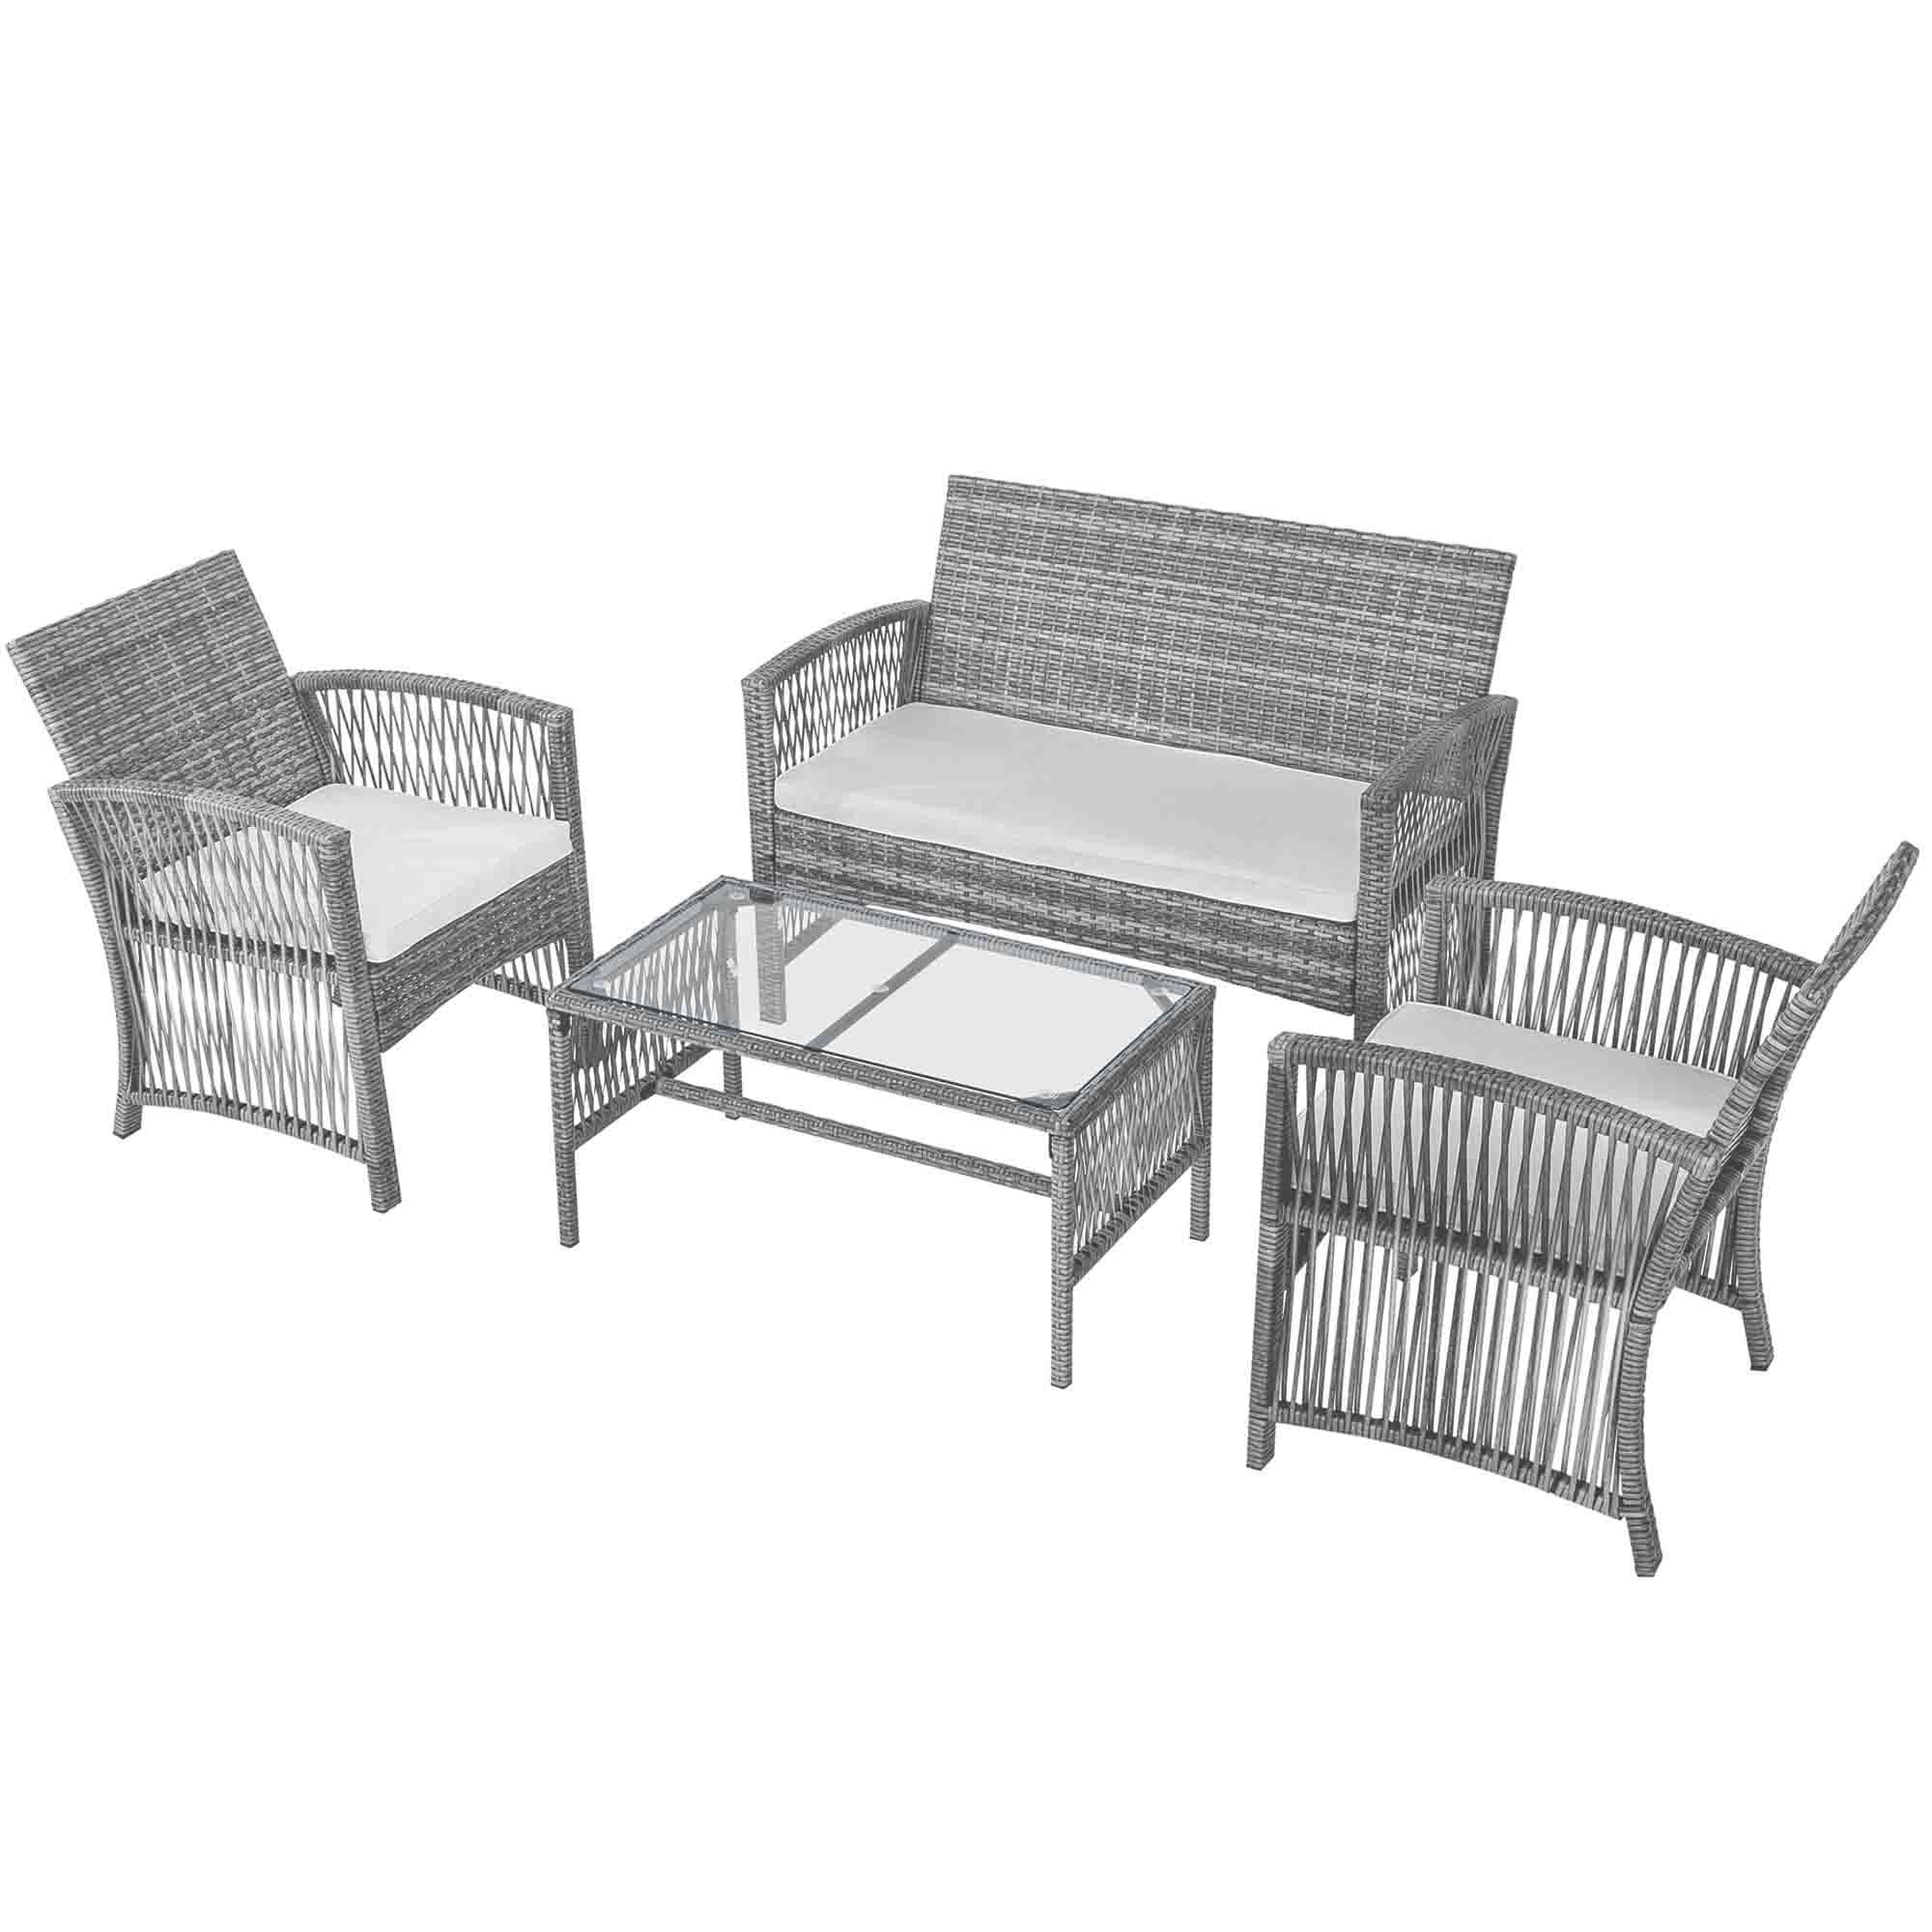 2020 WACO Outdoor Patio Furniture Rattan Chair & Table Set ...